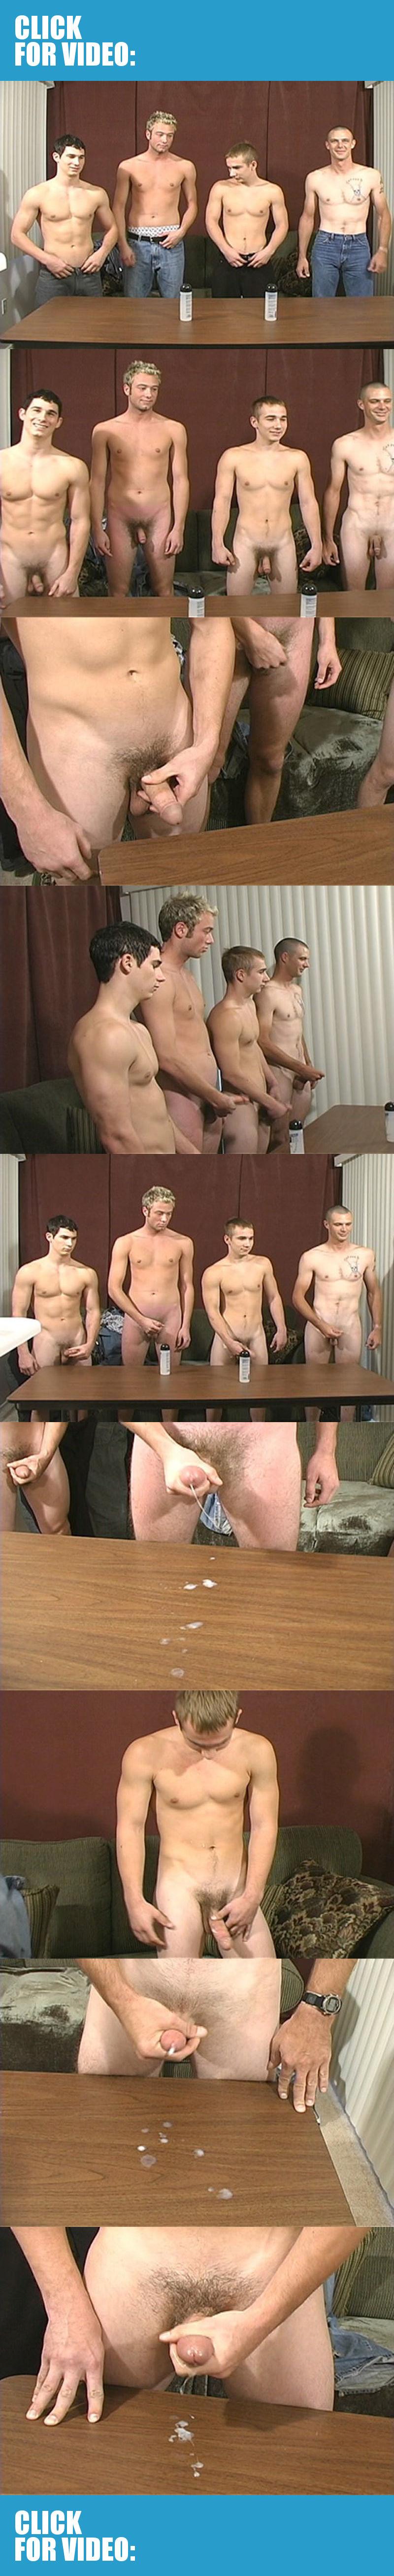 4 straight guys cum shot contest video seancody